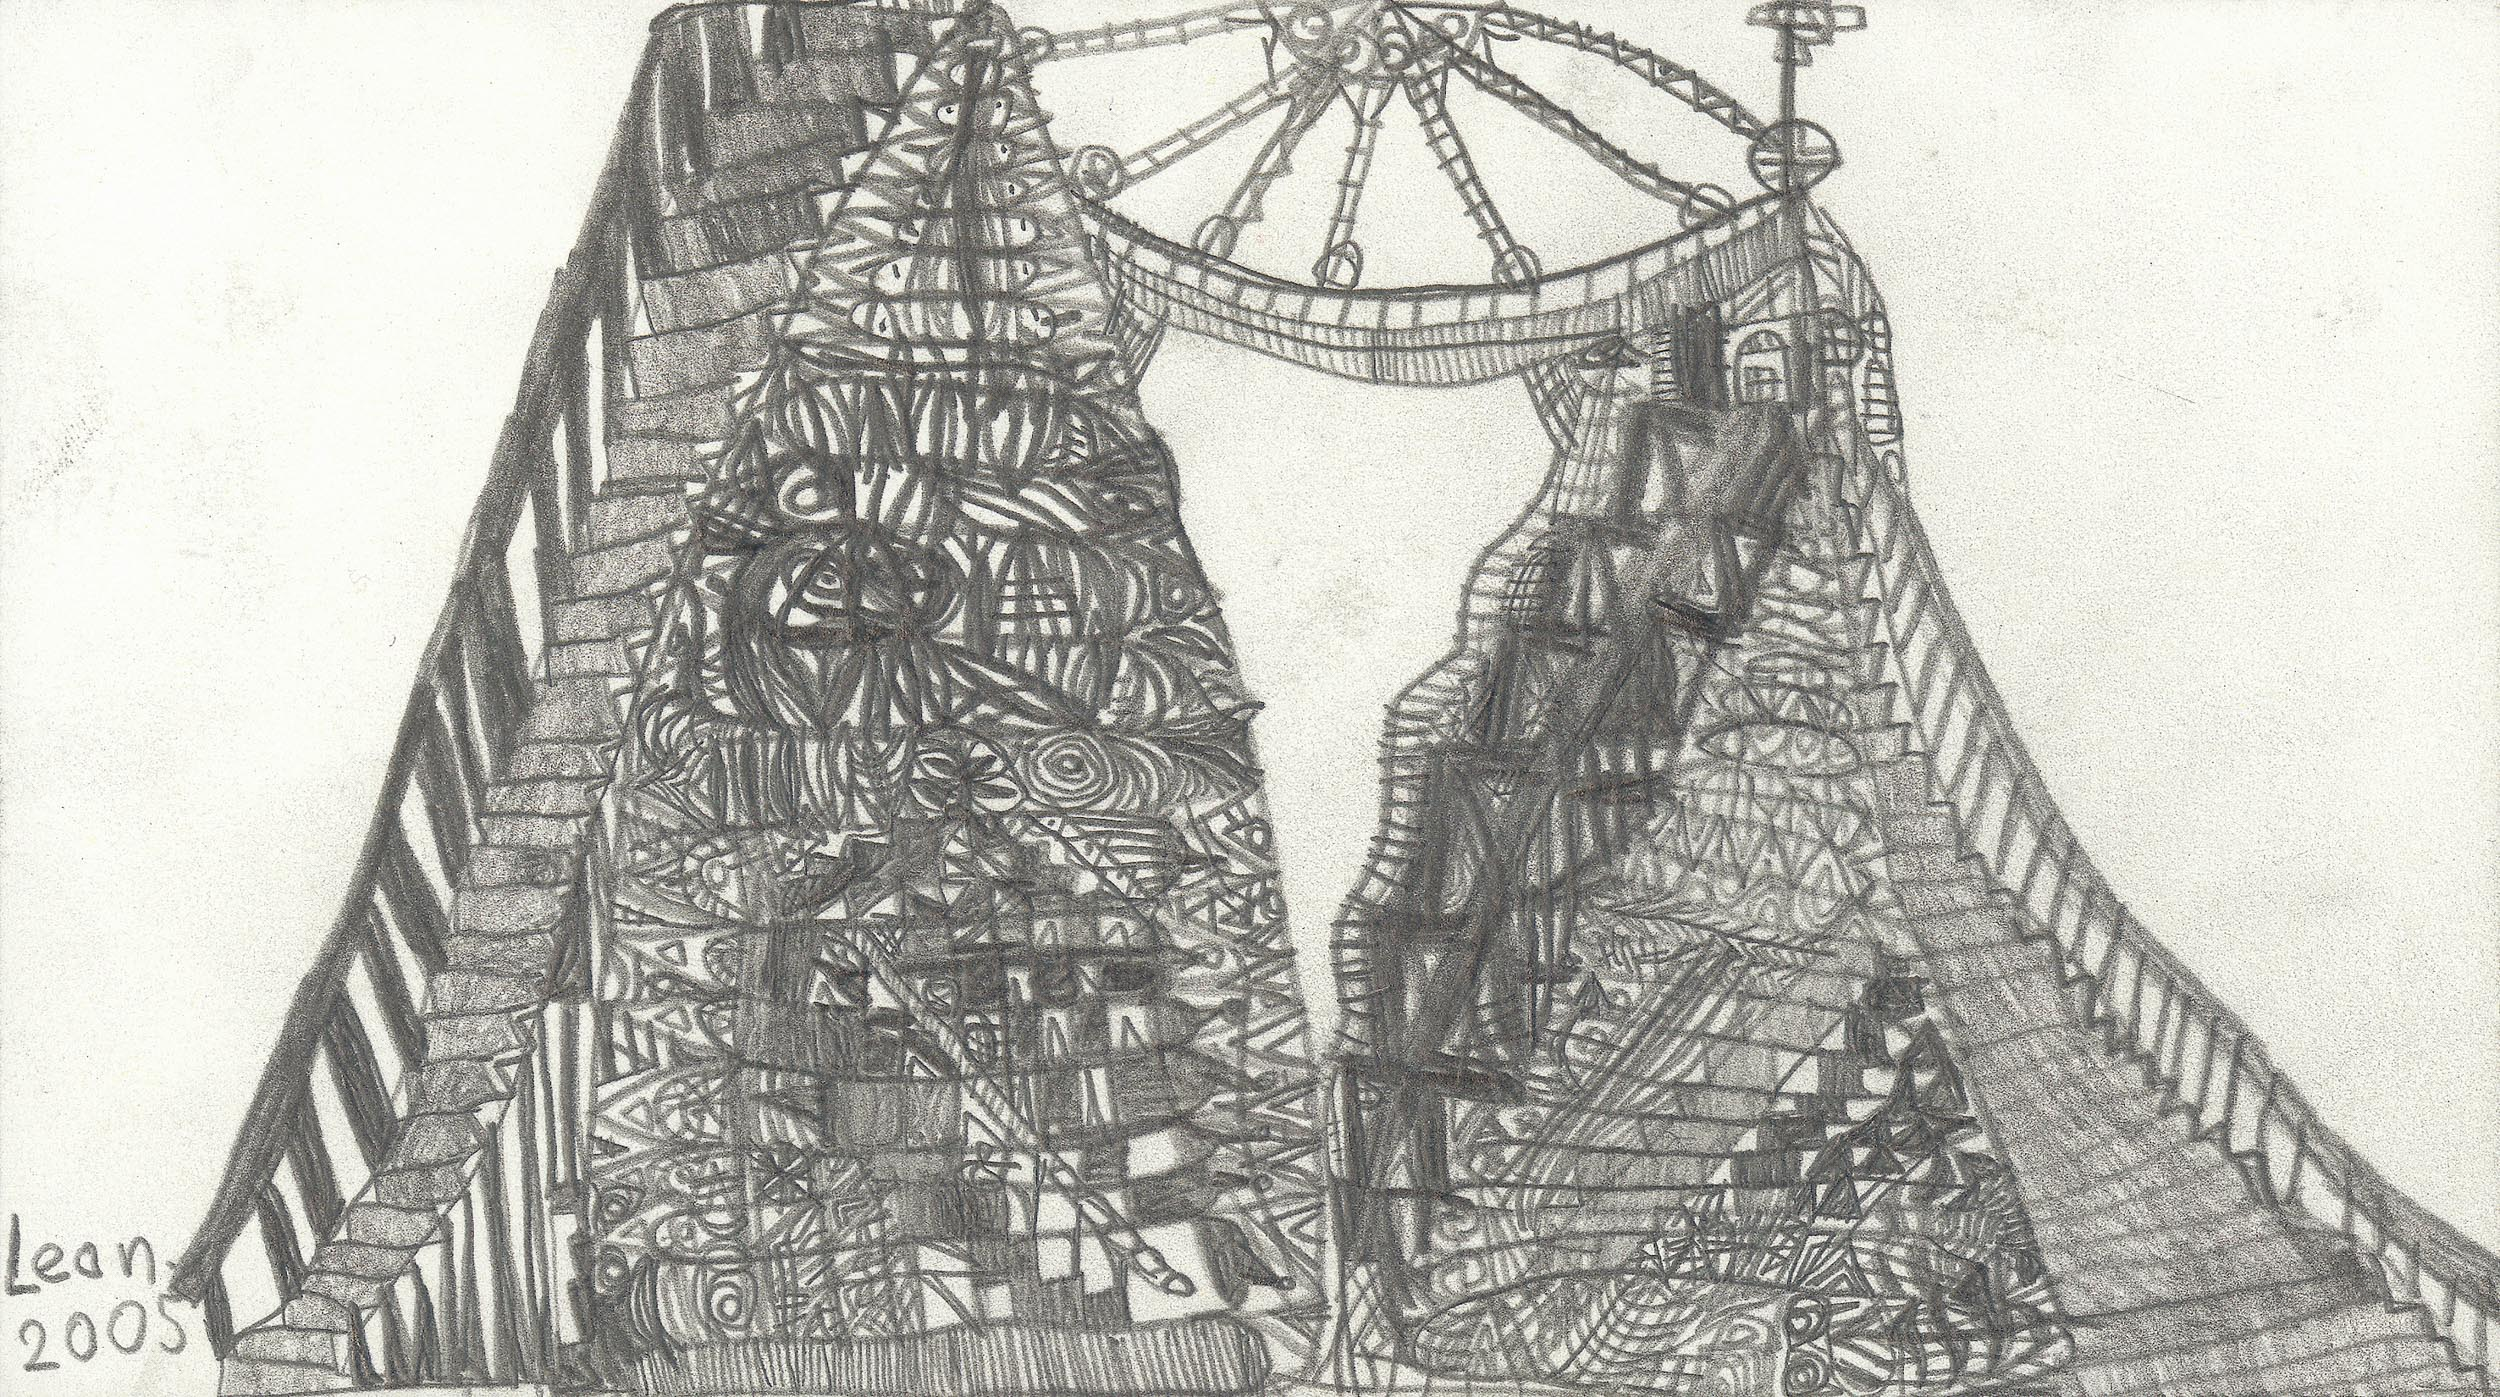 fink leonhard - Eine doppelte Pyramide in Amerika / A double pyramid in America